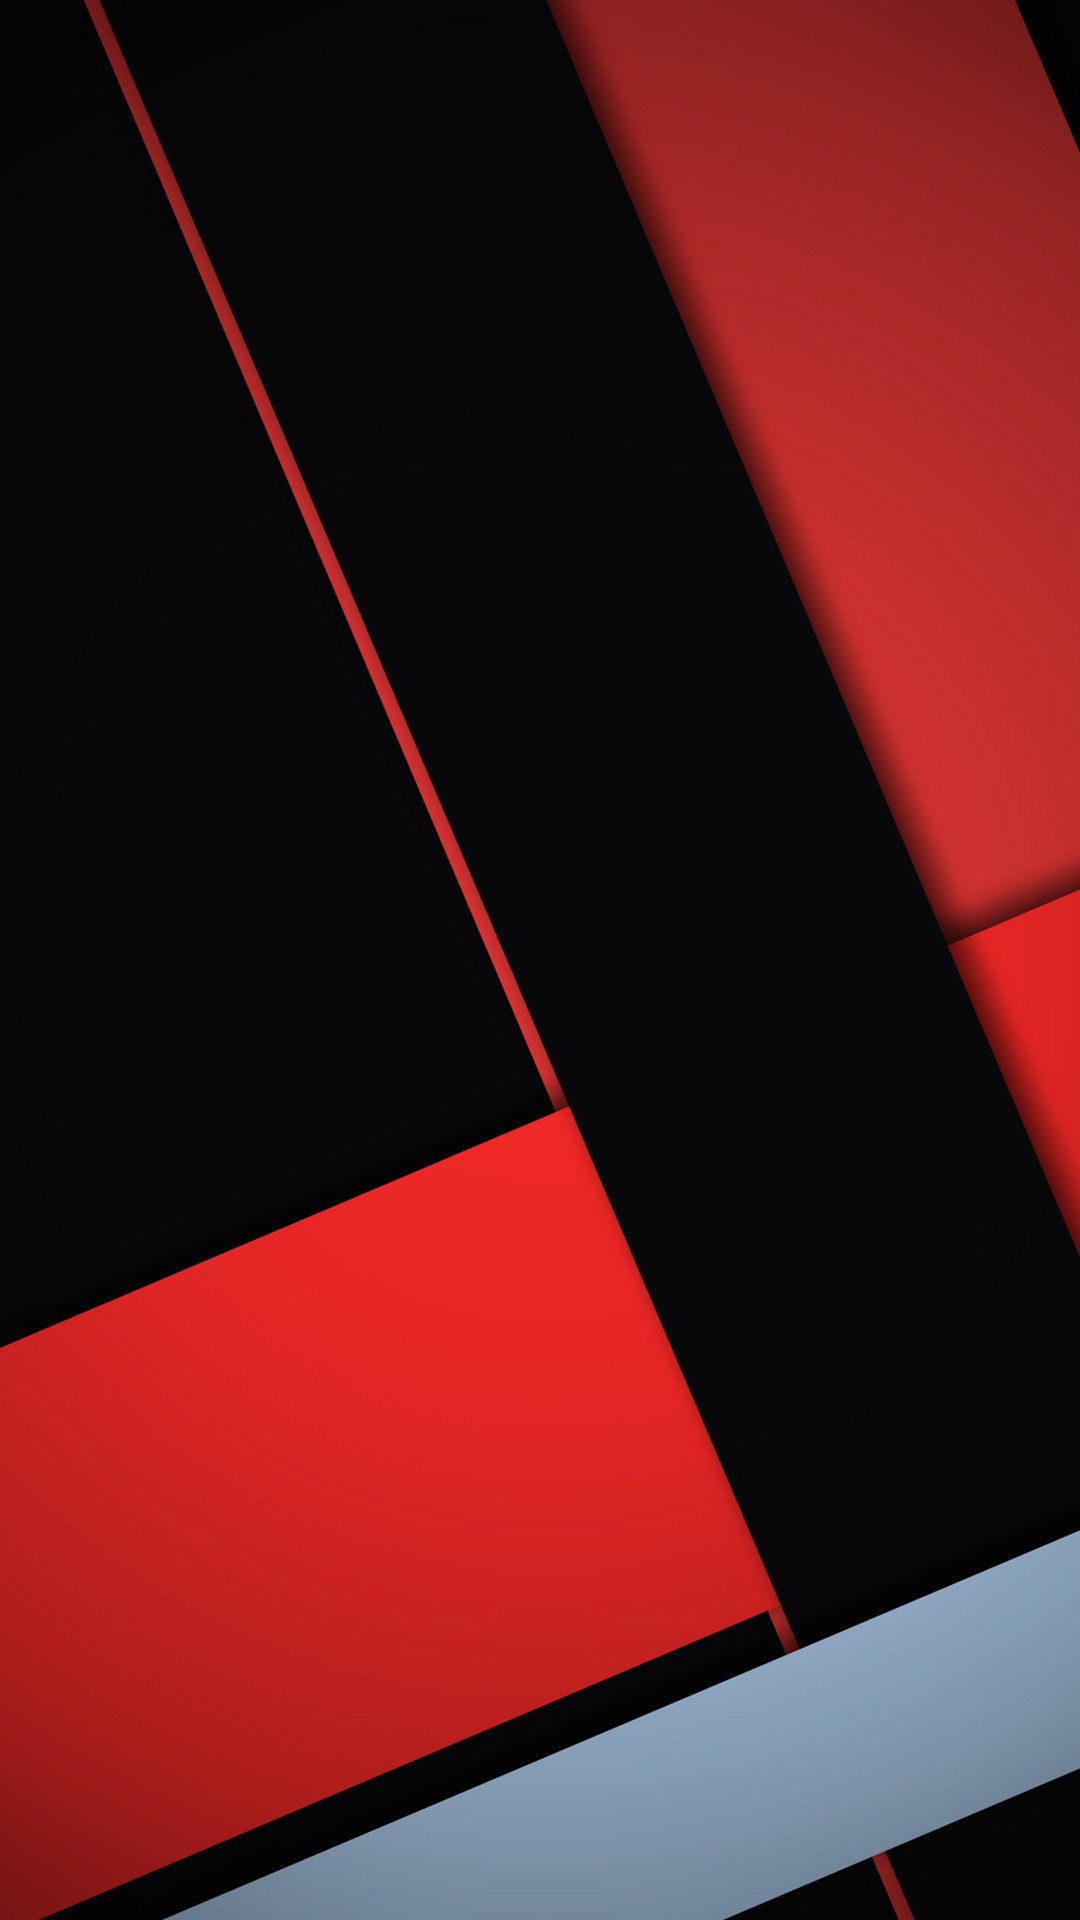 Modern Material Design HD Wallpaper Ideal for Smart Phones. Original  Resolution of